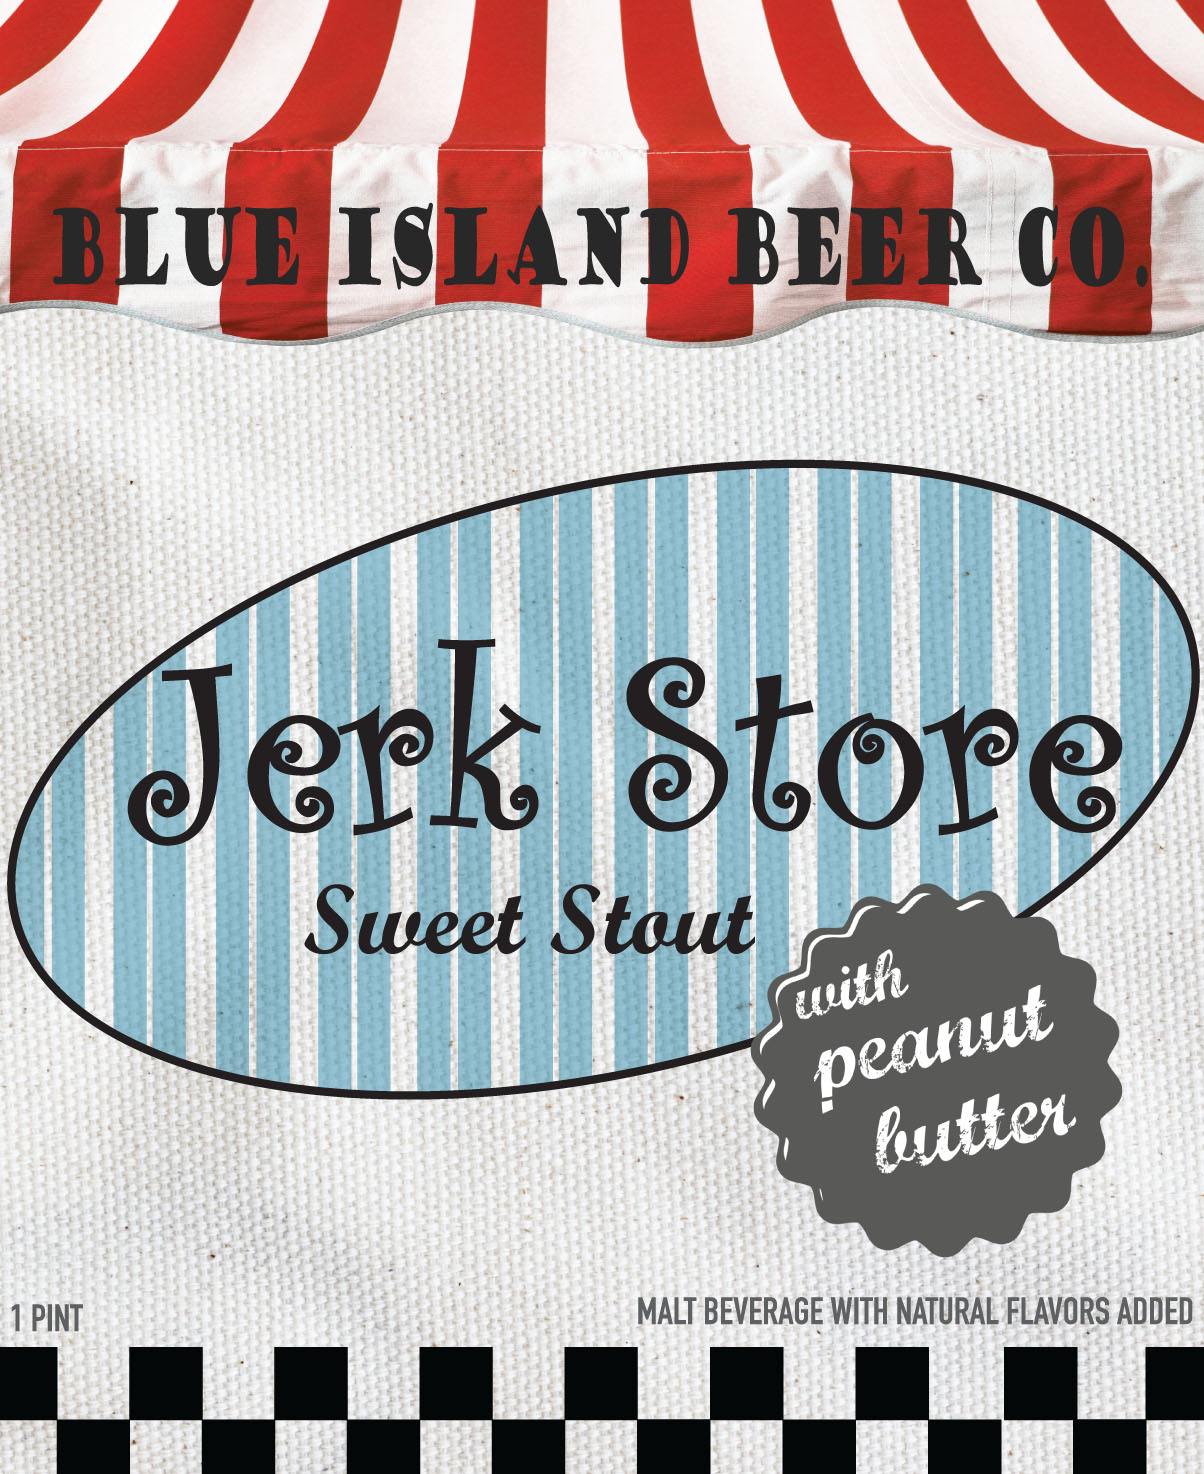 Peanut Butter Jerk Store